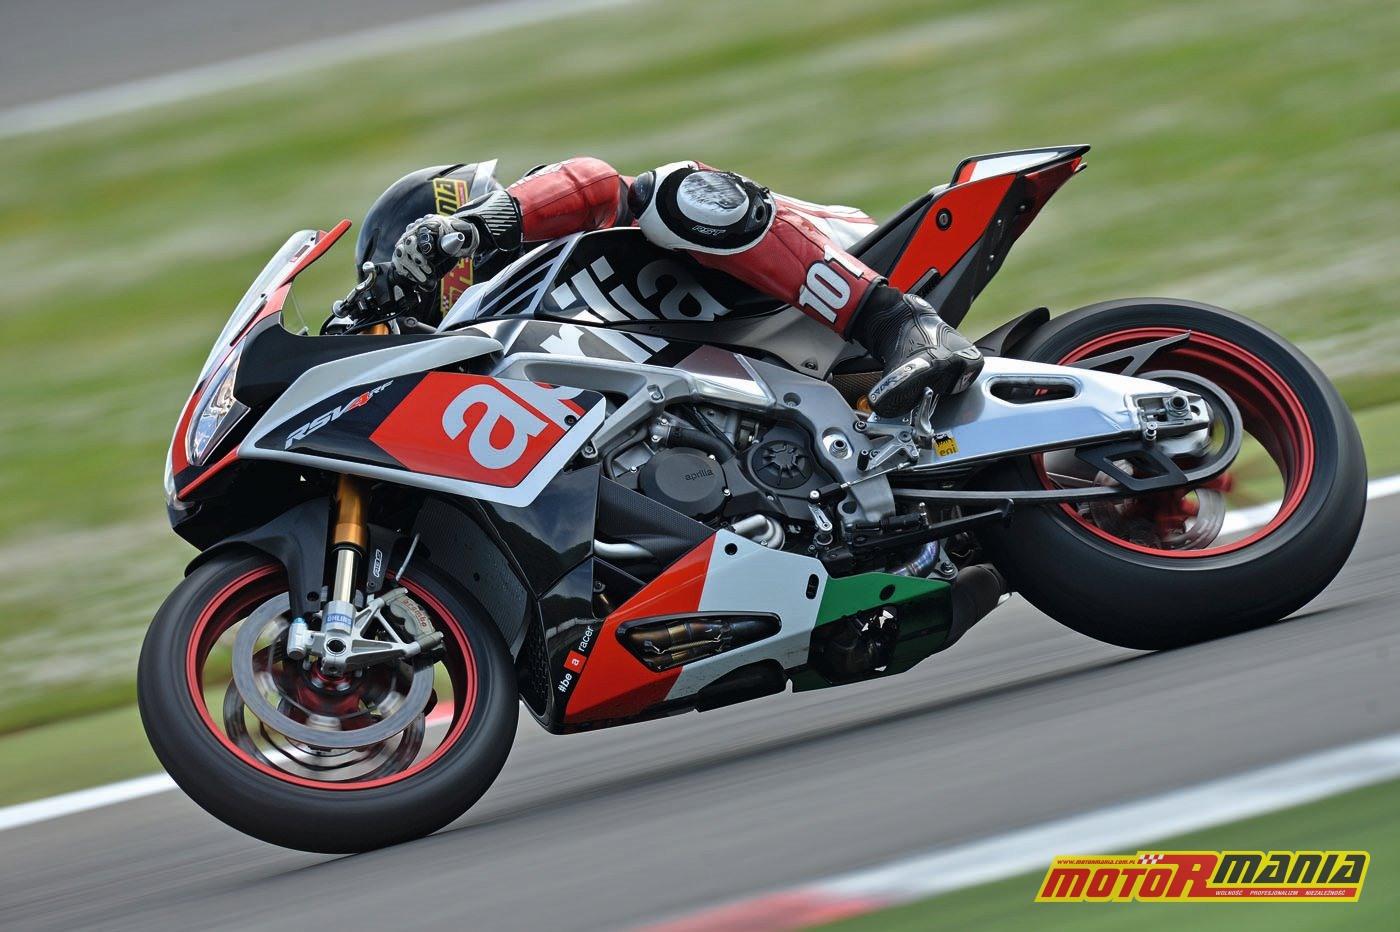 Aprilia RSV4 RF 2015 test motormania (6)